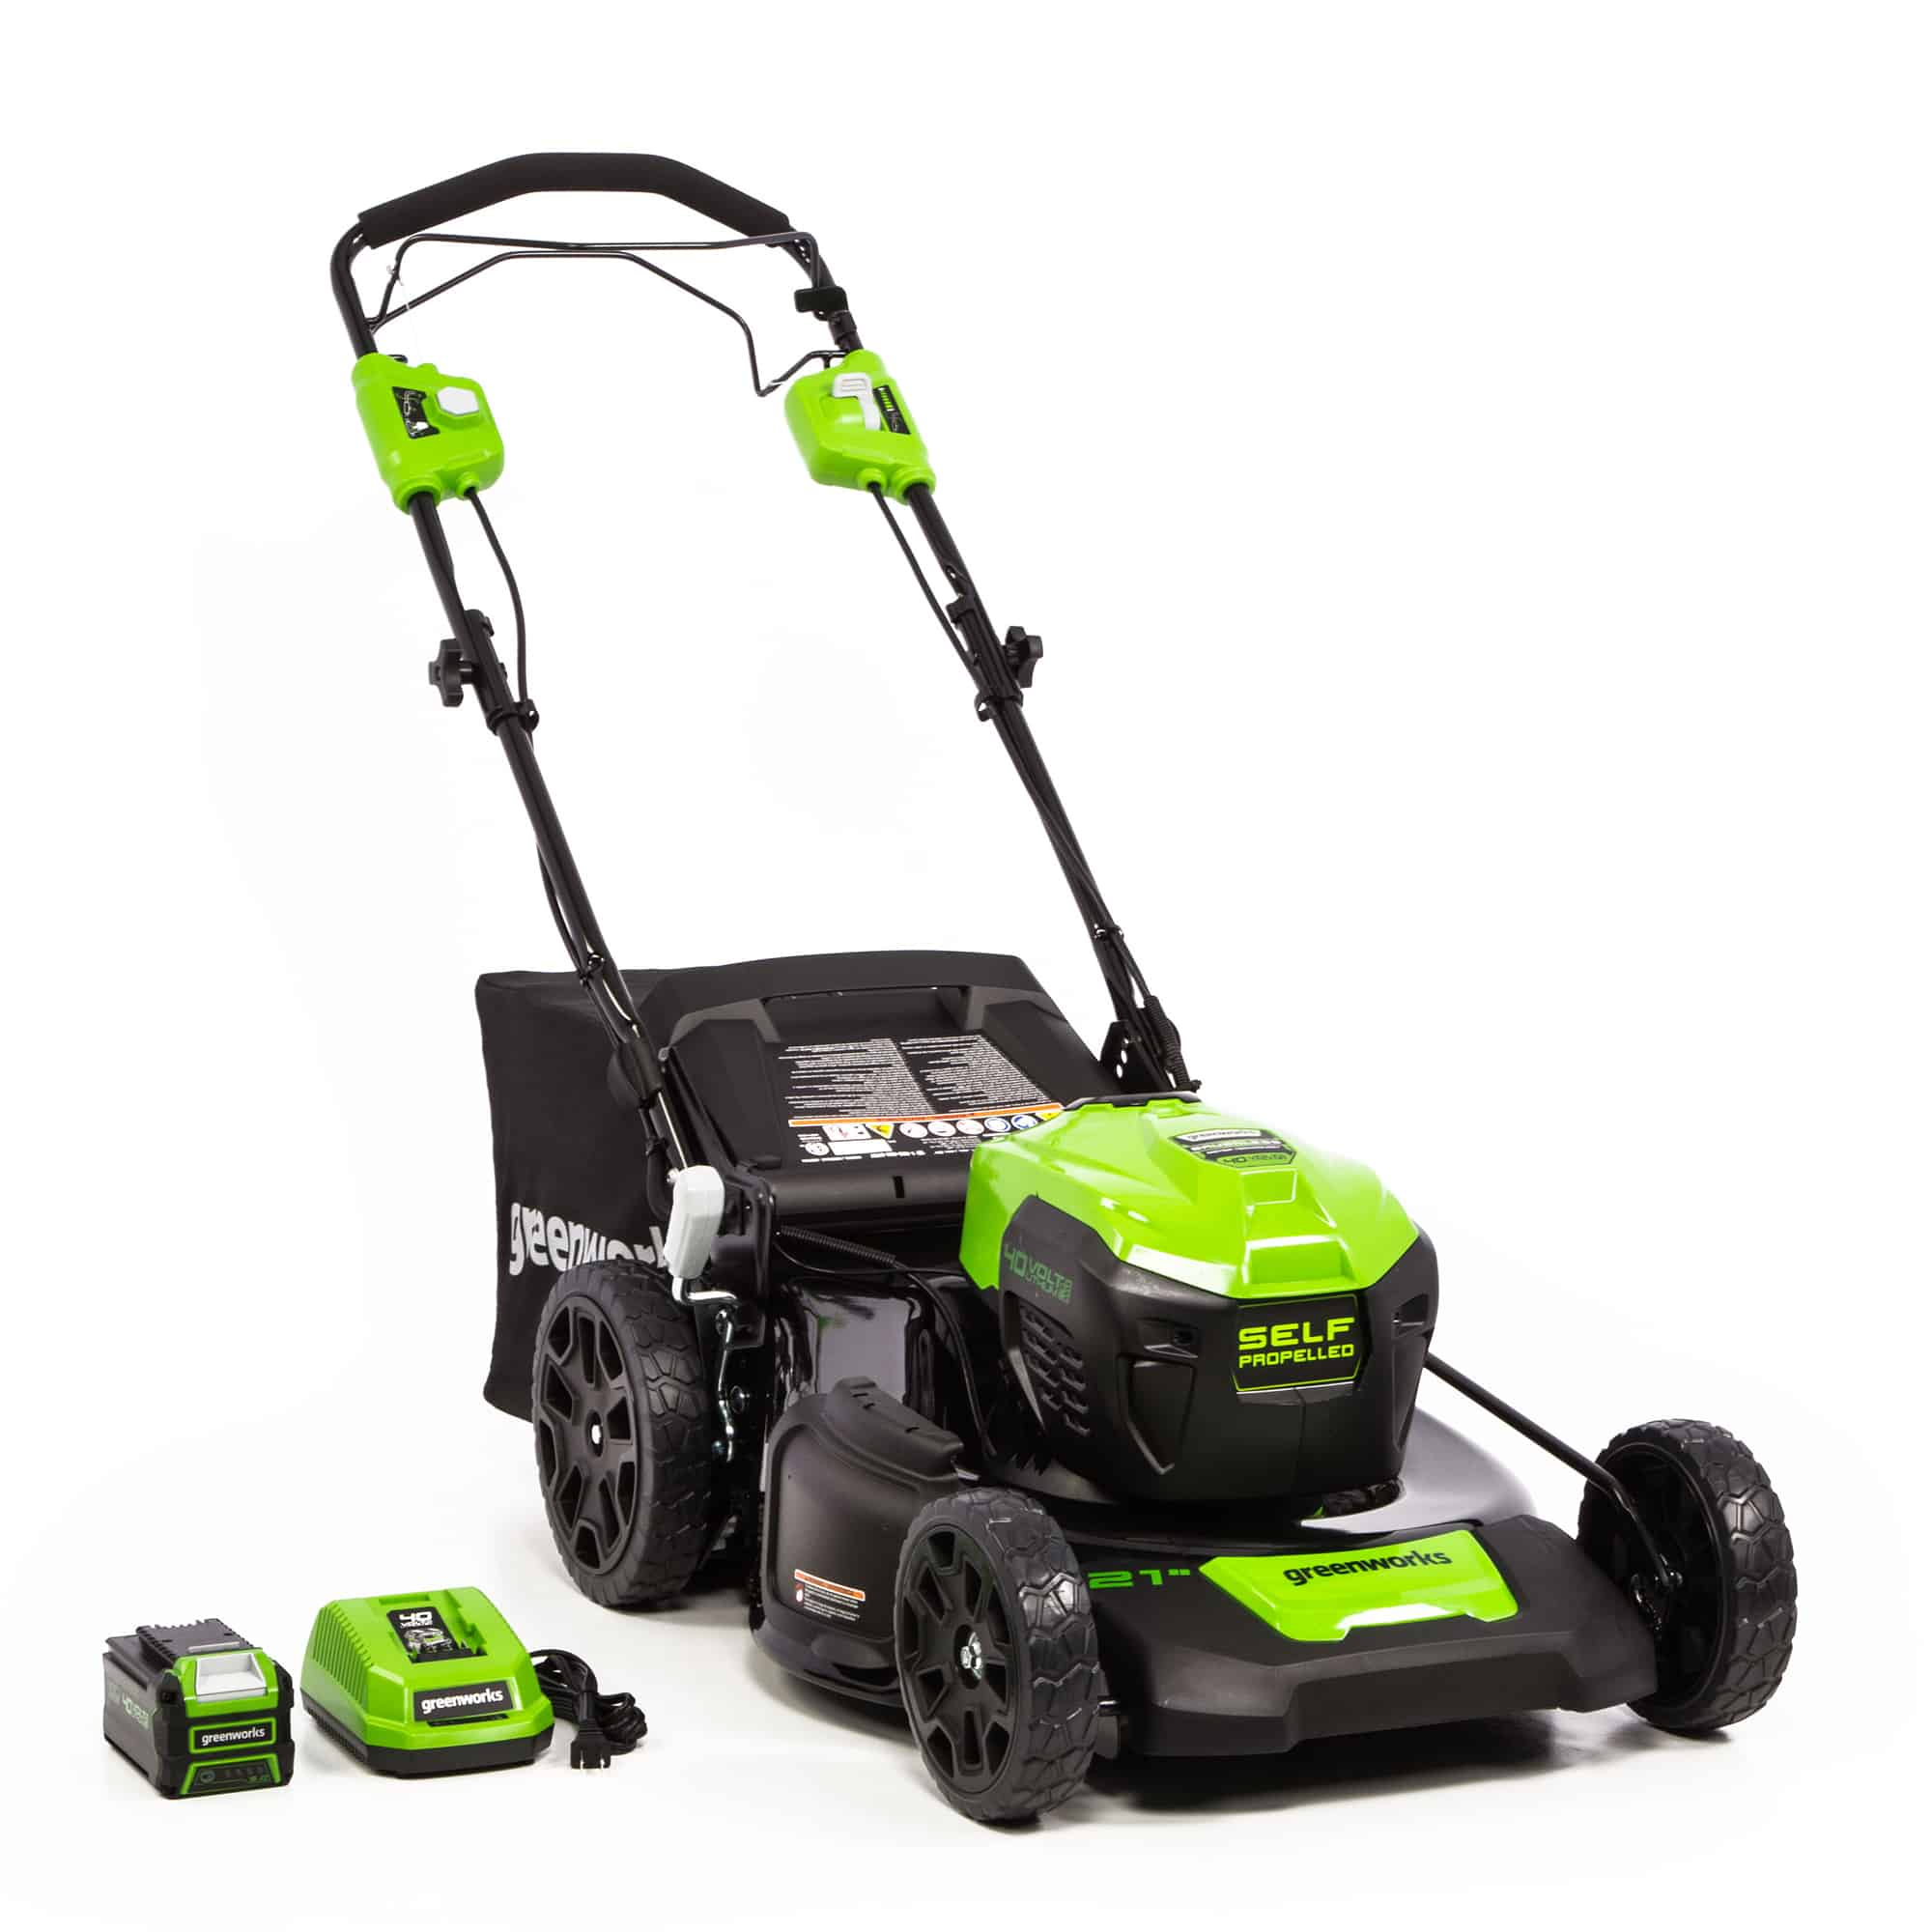 Greenworks Pro 21-Inch Cordless Push Lawn Mower - Best Cordless Push Lawn Mower